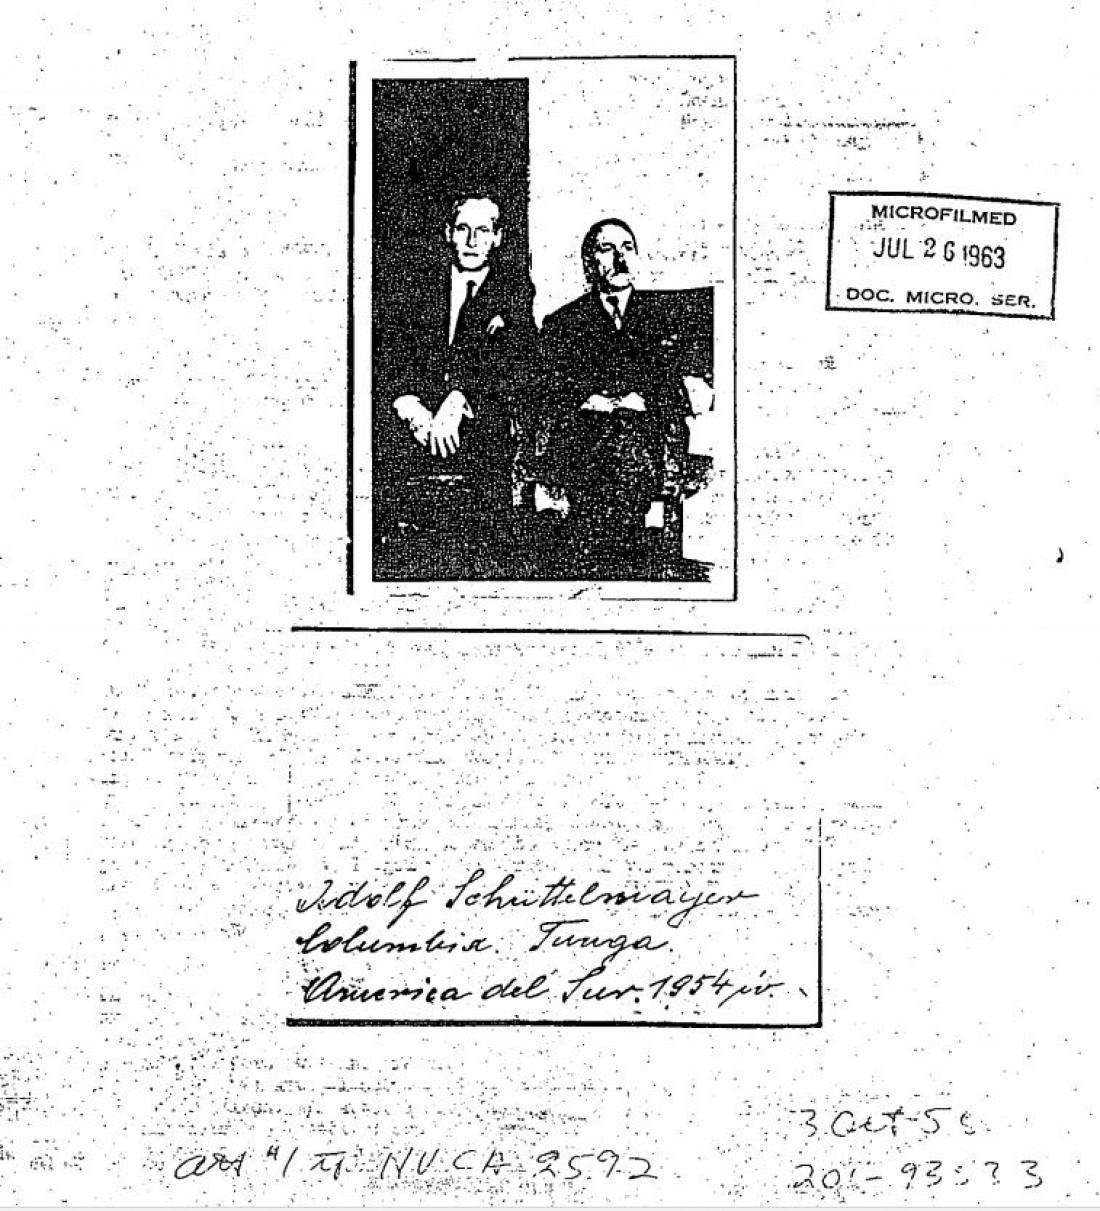 К документам была прикреплена фотография